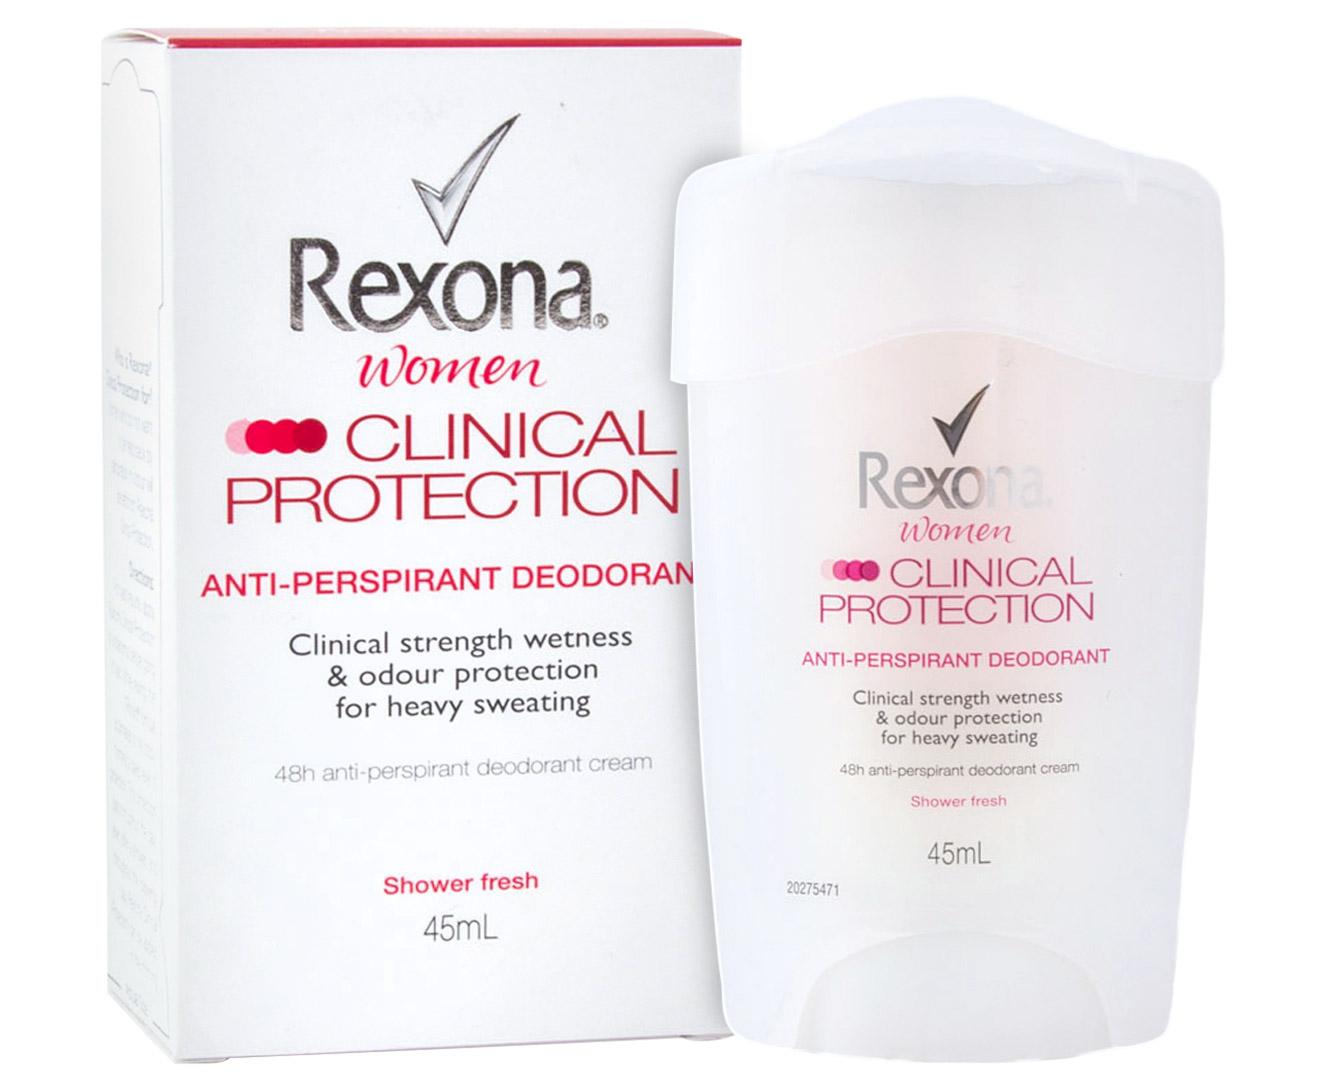 Rexona Women Clinical Protection Roll On Deodorant Shower Fresh 45ml Natural 50ml